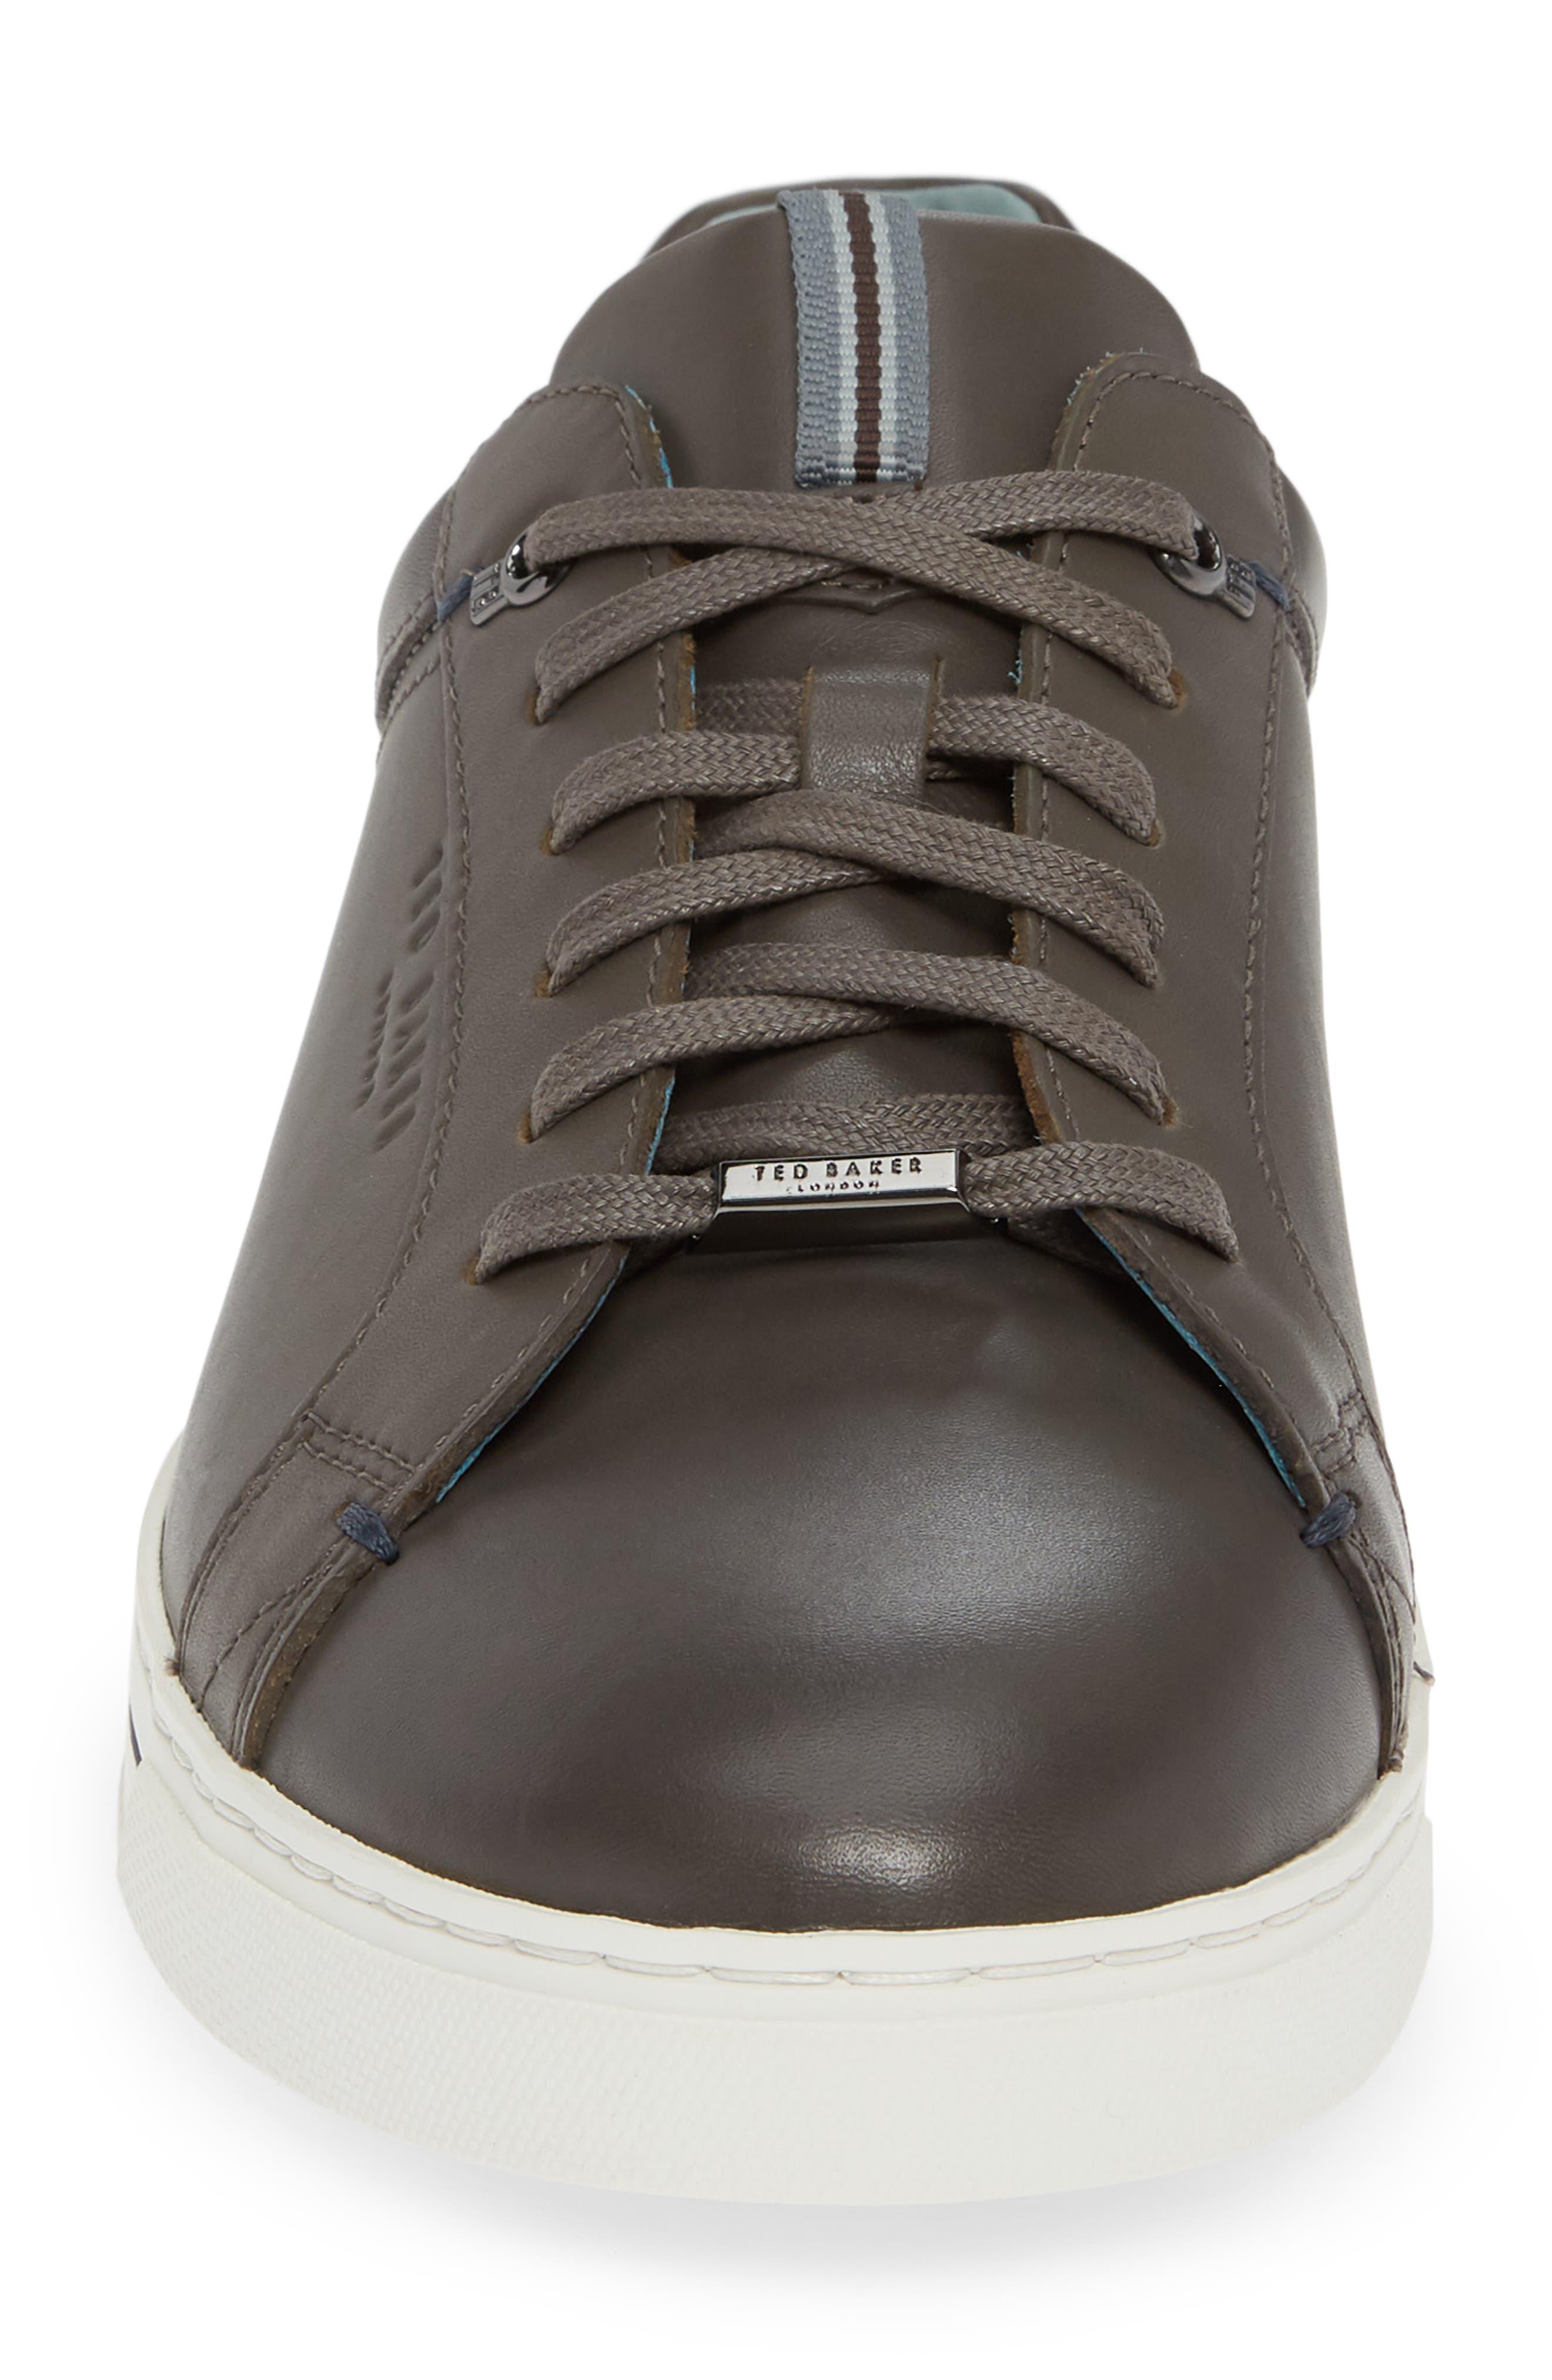 Thawne Sneaker,                             Alternate thumbnail 4, color,                             DARK GREY LEATHER